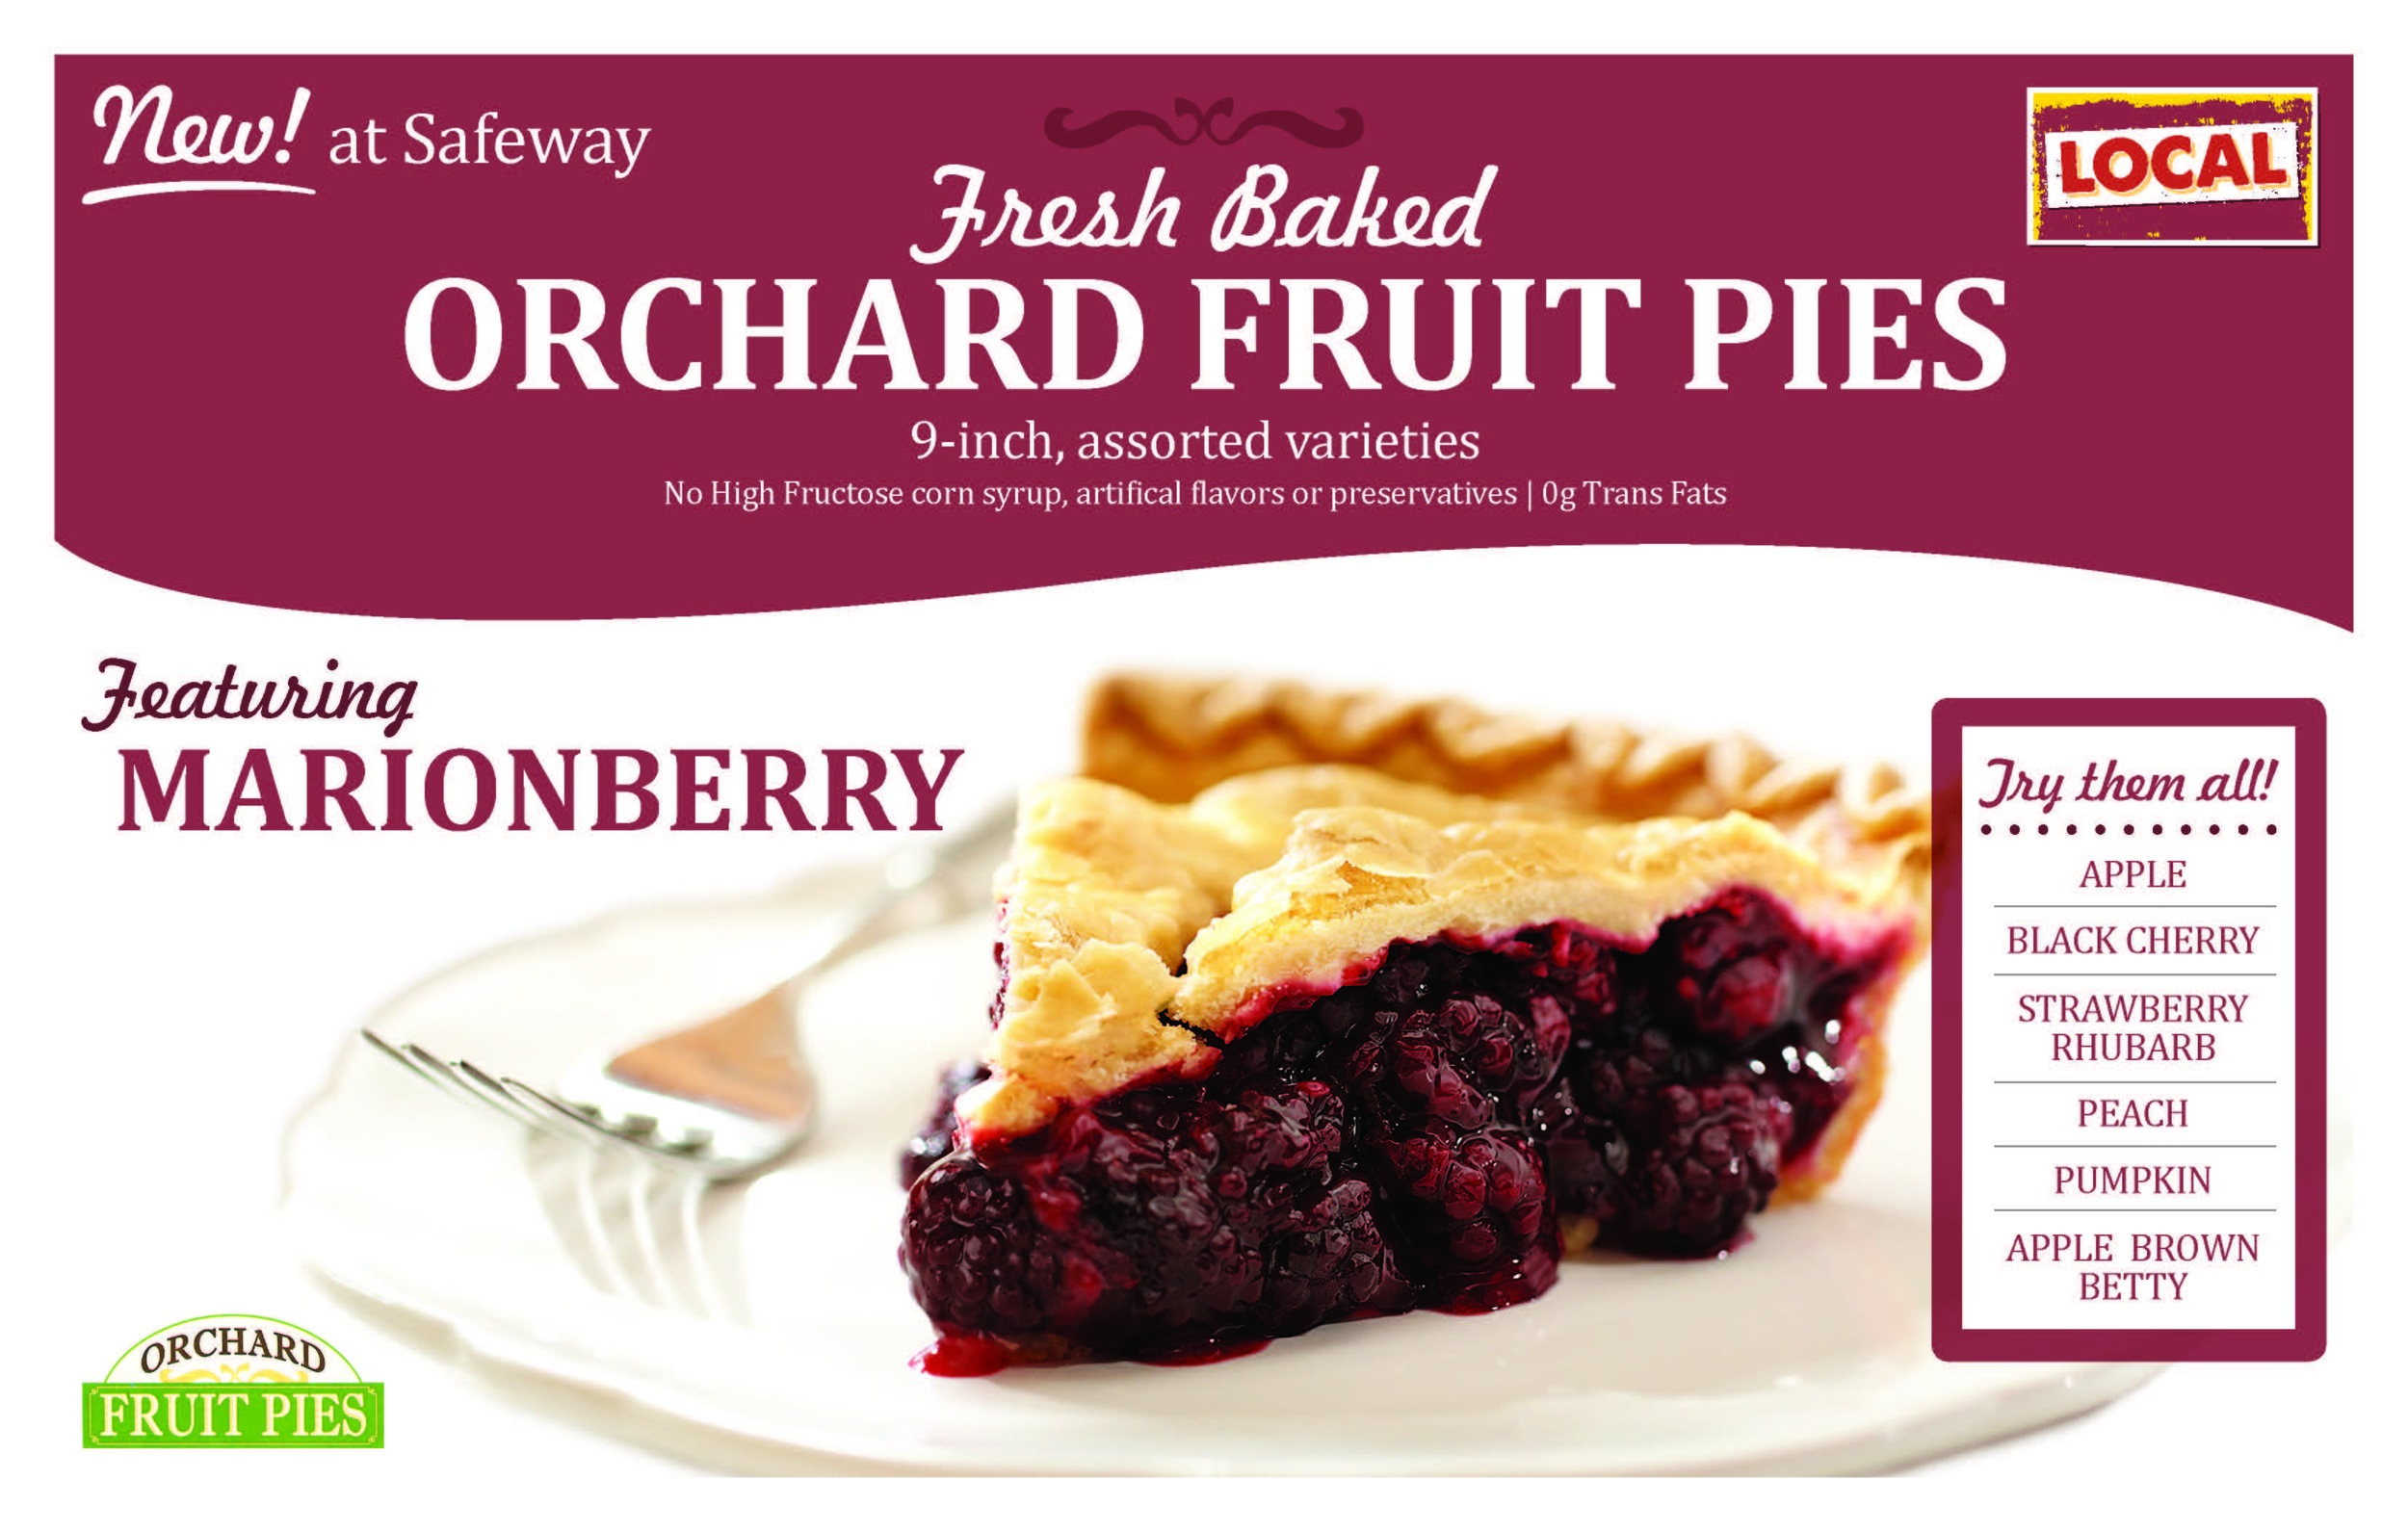 OrchardFresh_Pies_SWY_11x7.jpg